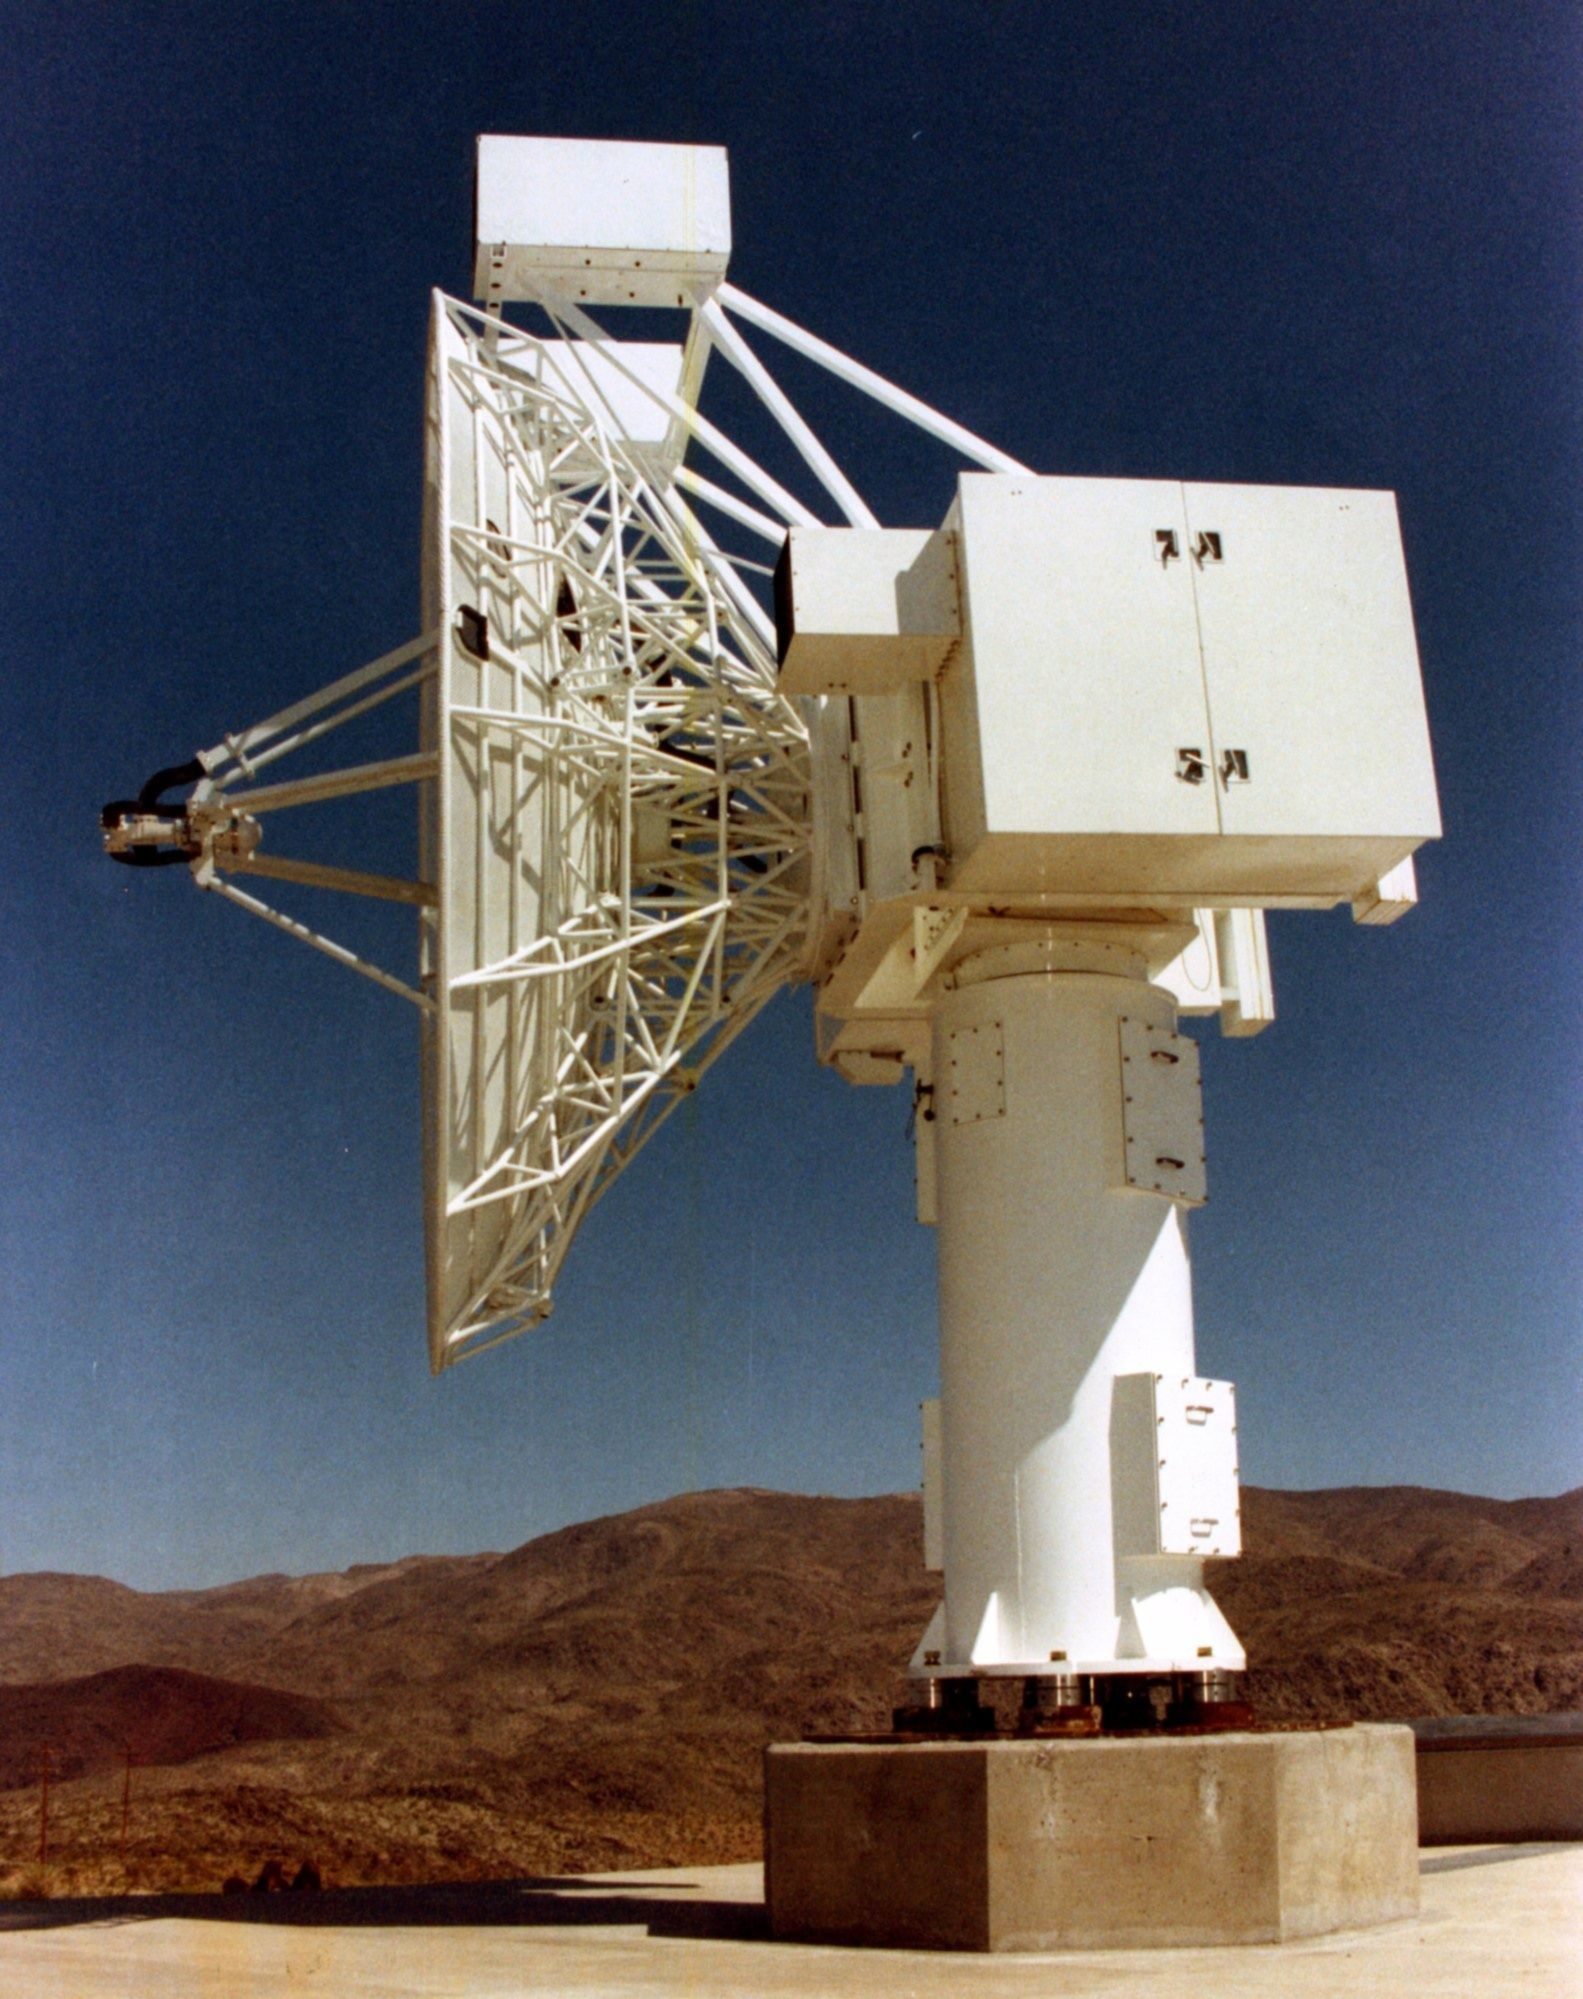 S-Band Precision Range Radar